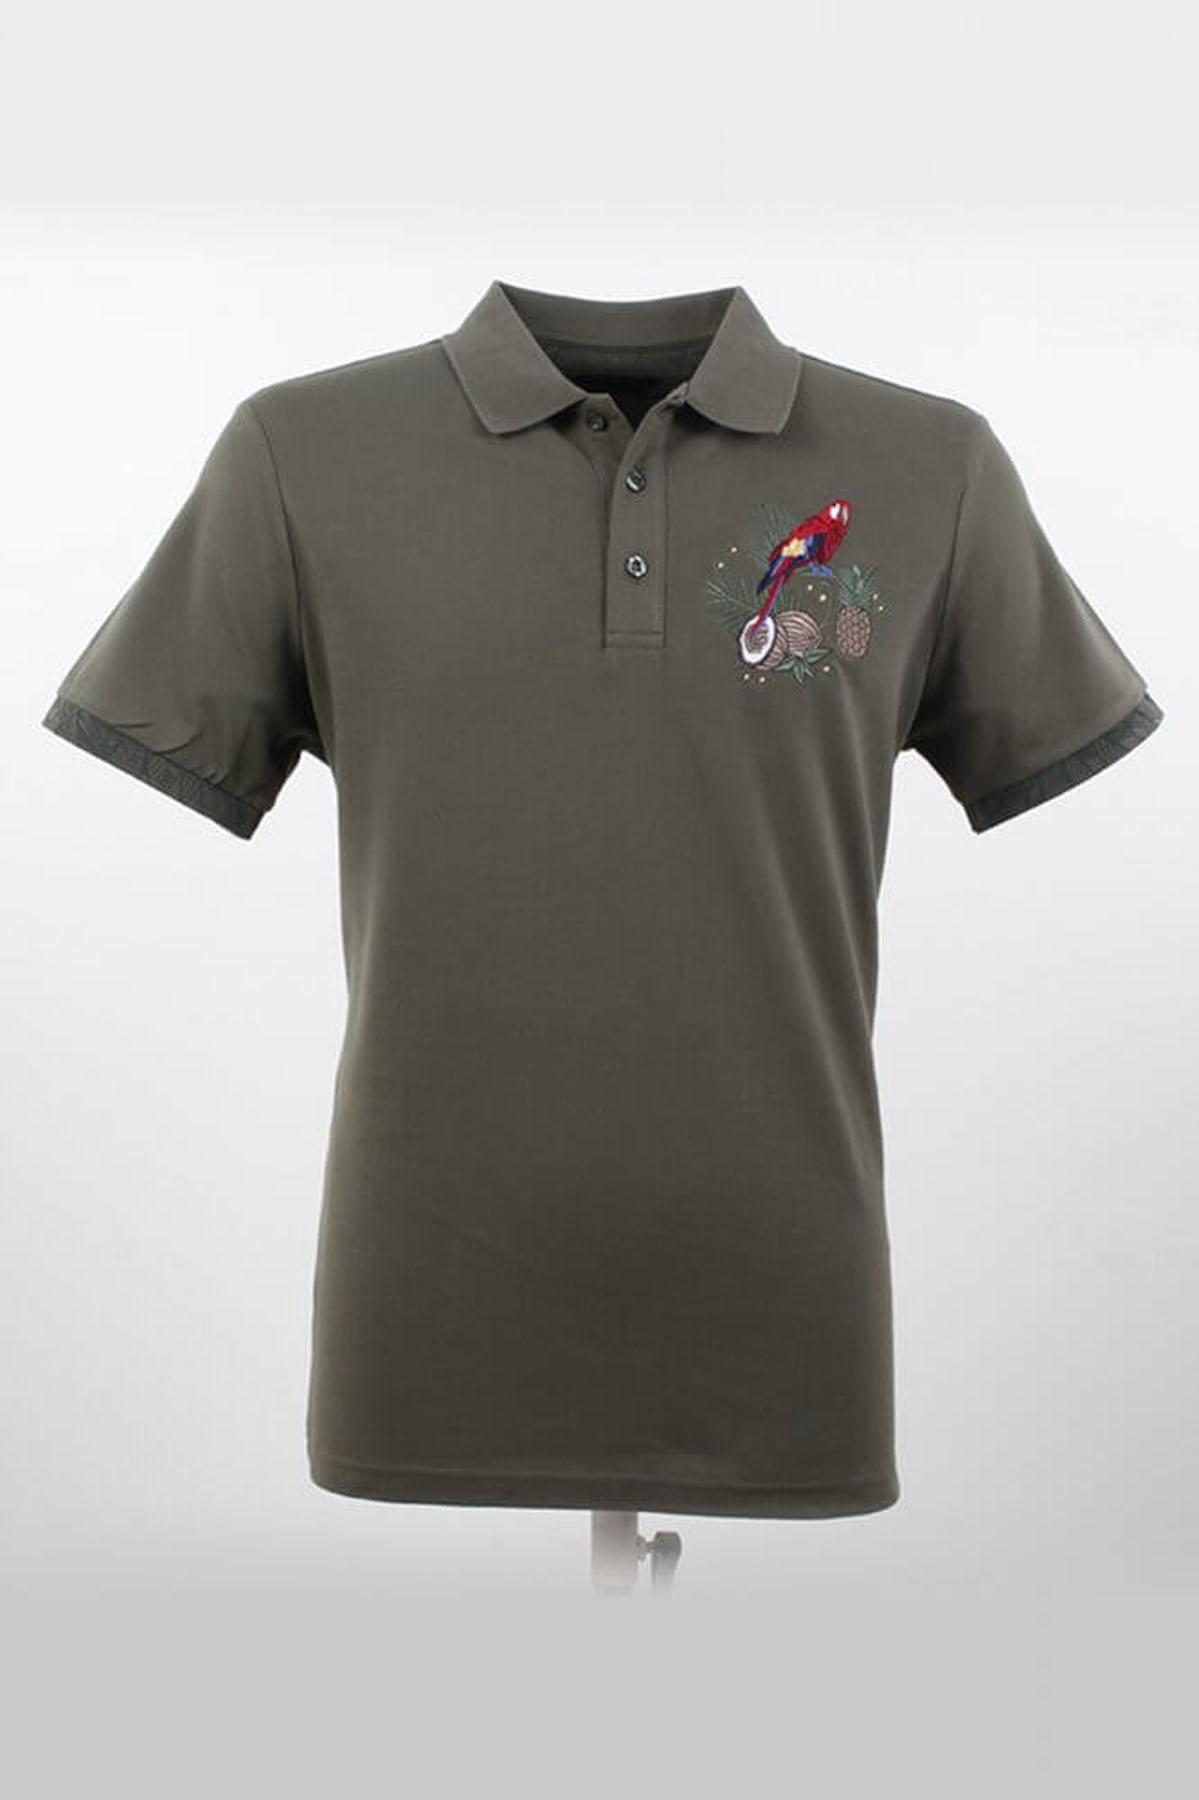 Polo Yaka Desenli Çağla T-Shirt